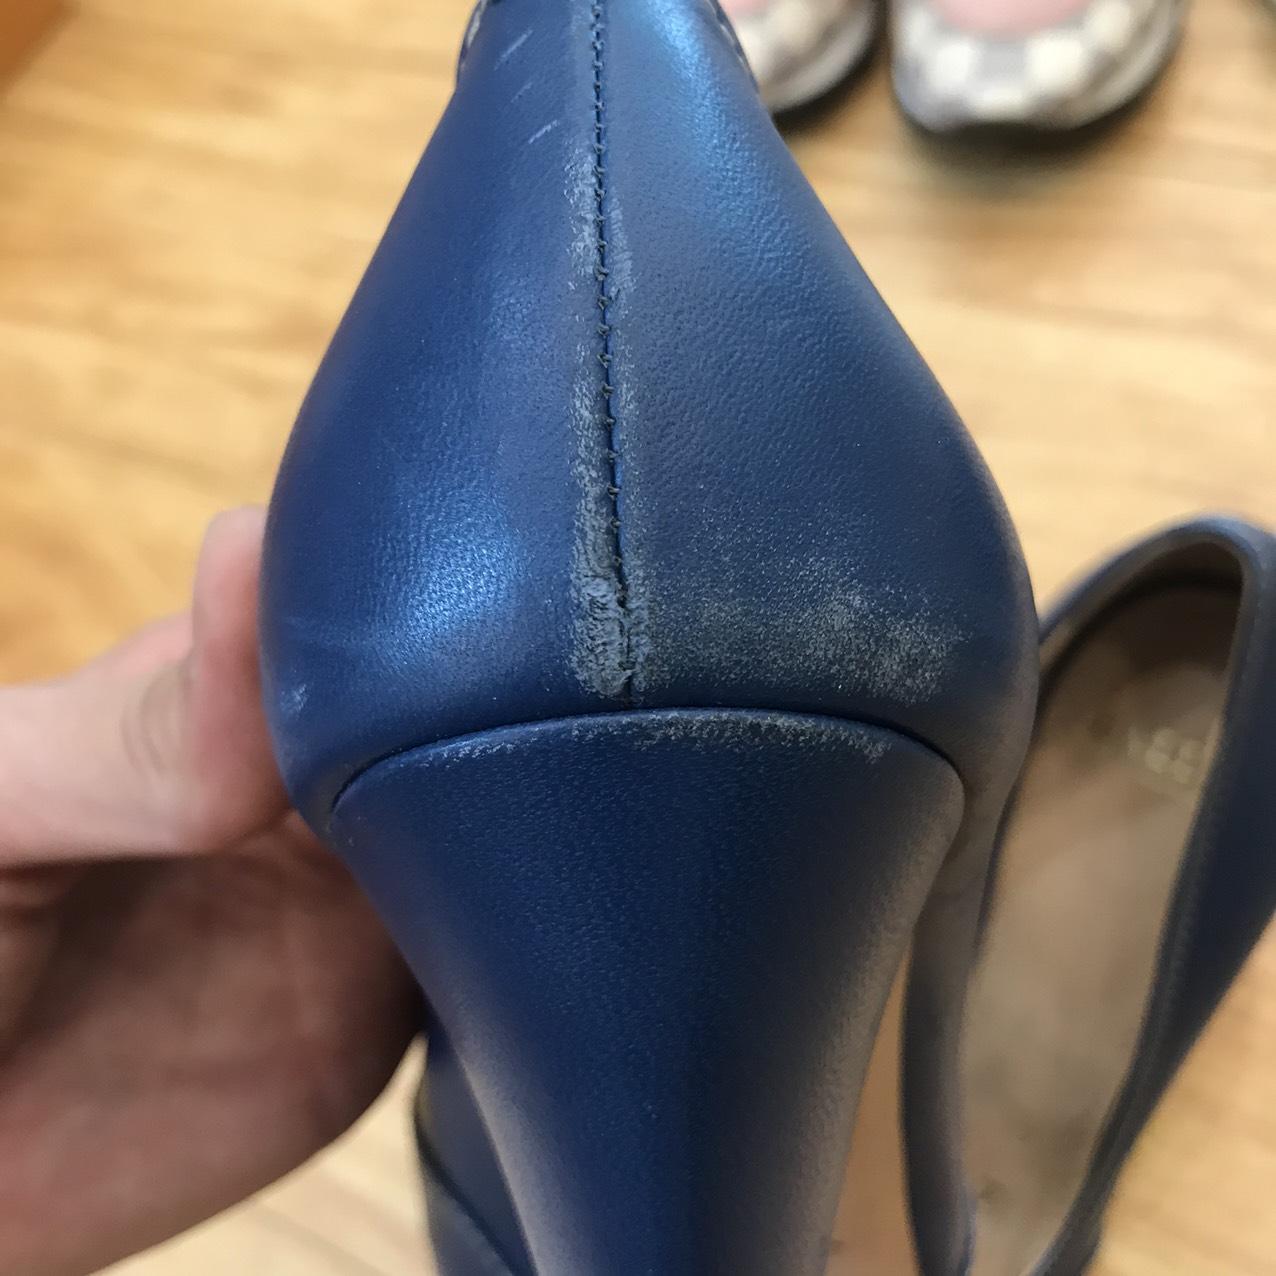 Sửa Chữa Giày Dép Gucci, Chanel, Louis Vuitton, Hermes ... 15